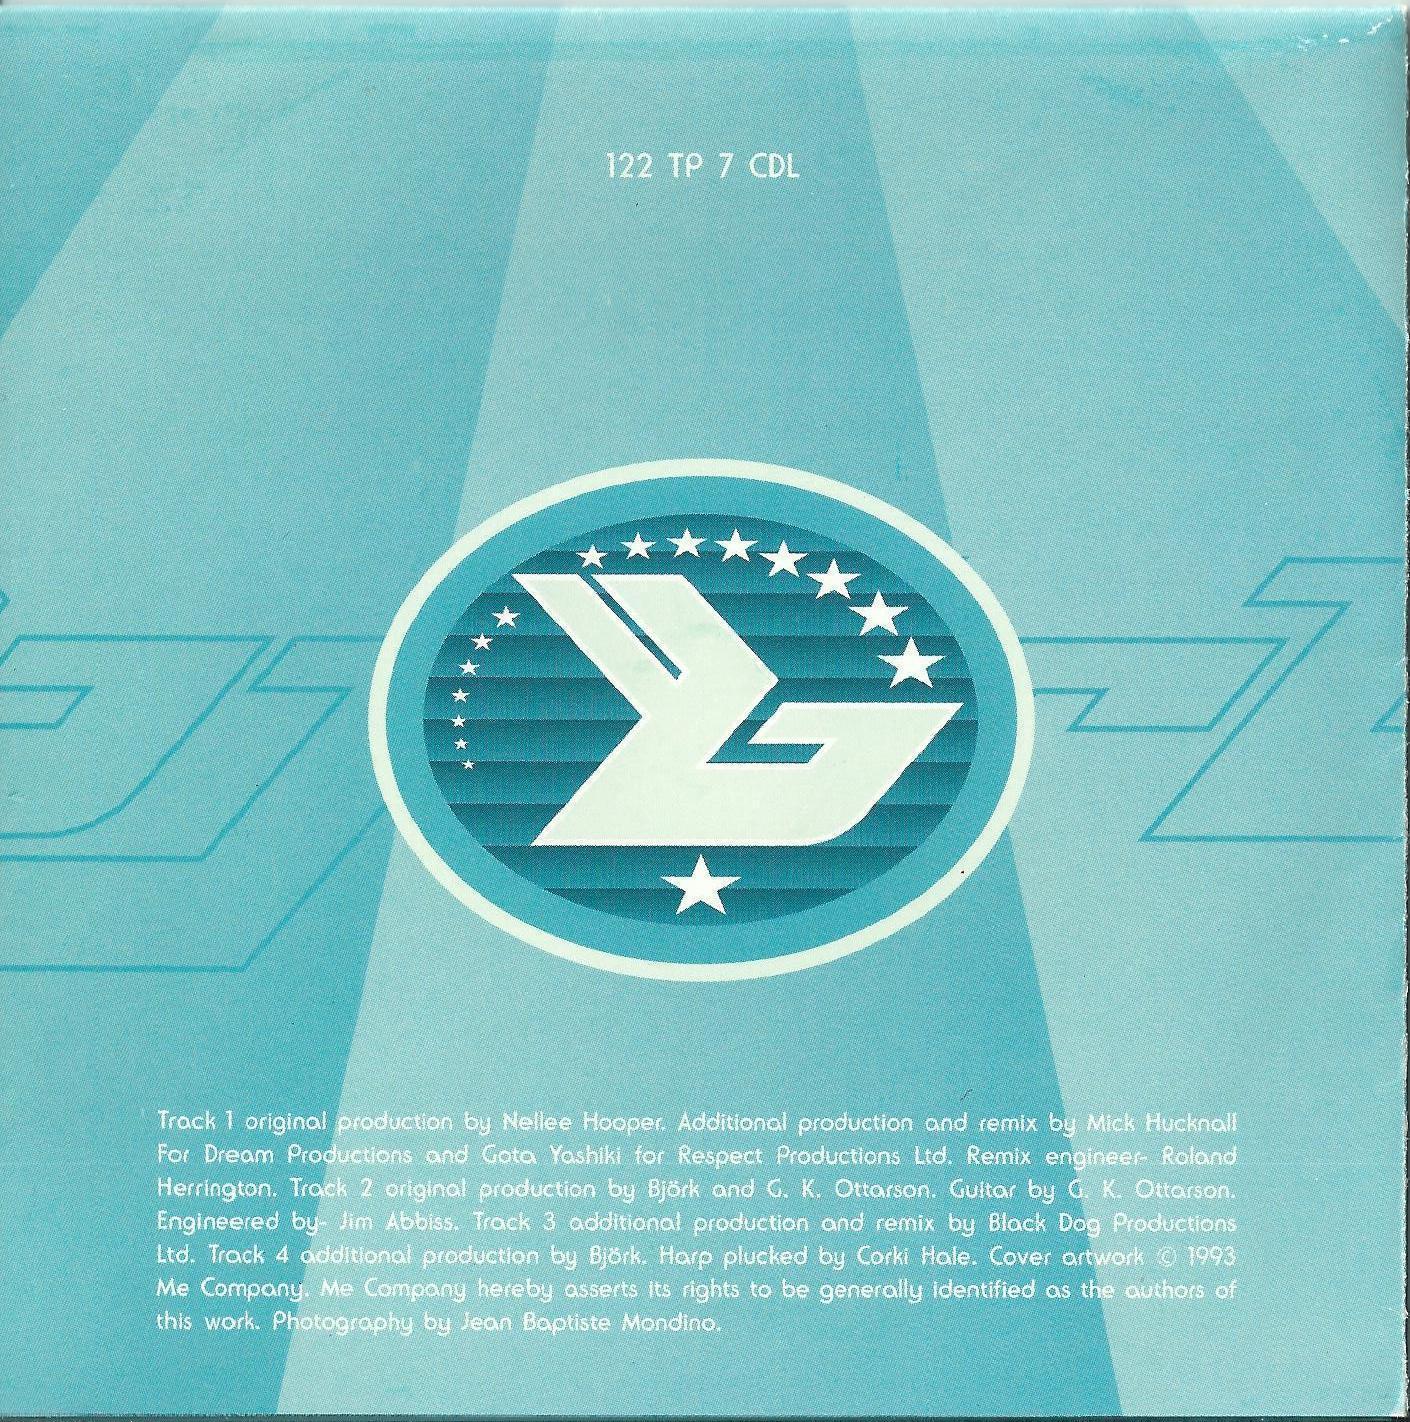 BJORK - VENUS AS A BOY 1993 UK 4 TRACK CD SINGLE 122TP7CDL